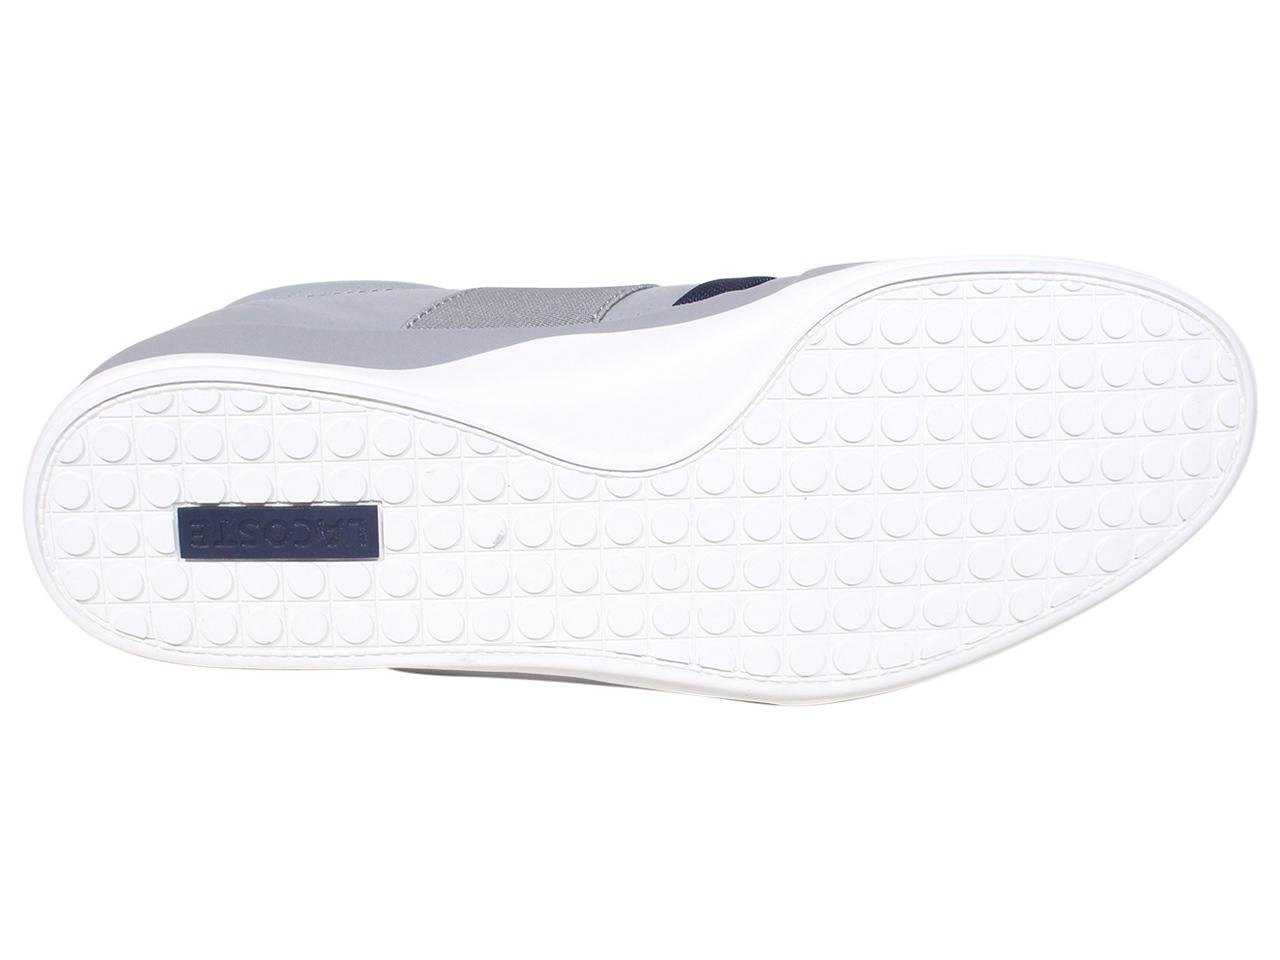 Lacoste-Misano-Elastic-318-Sneakers-Men-039-s-Low-Top-Shoes thumbnail 21